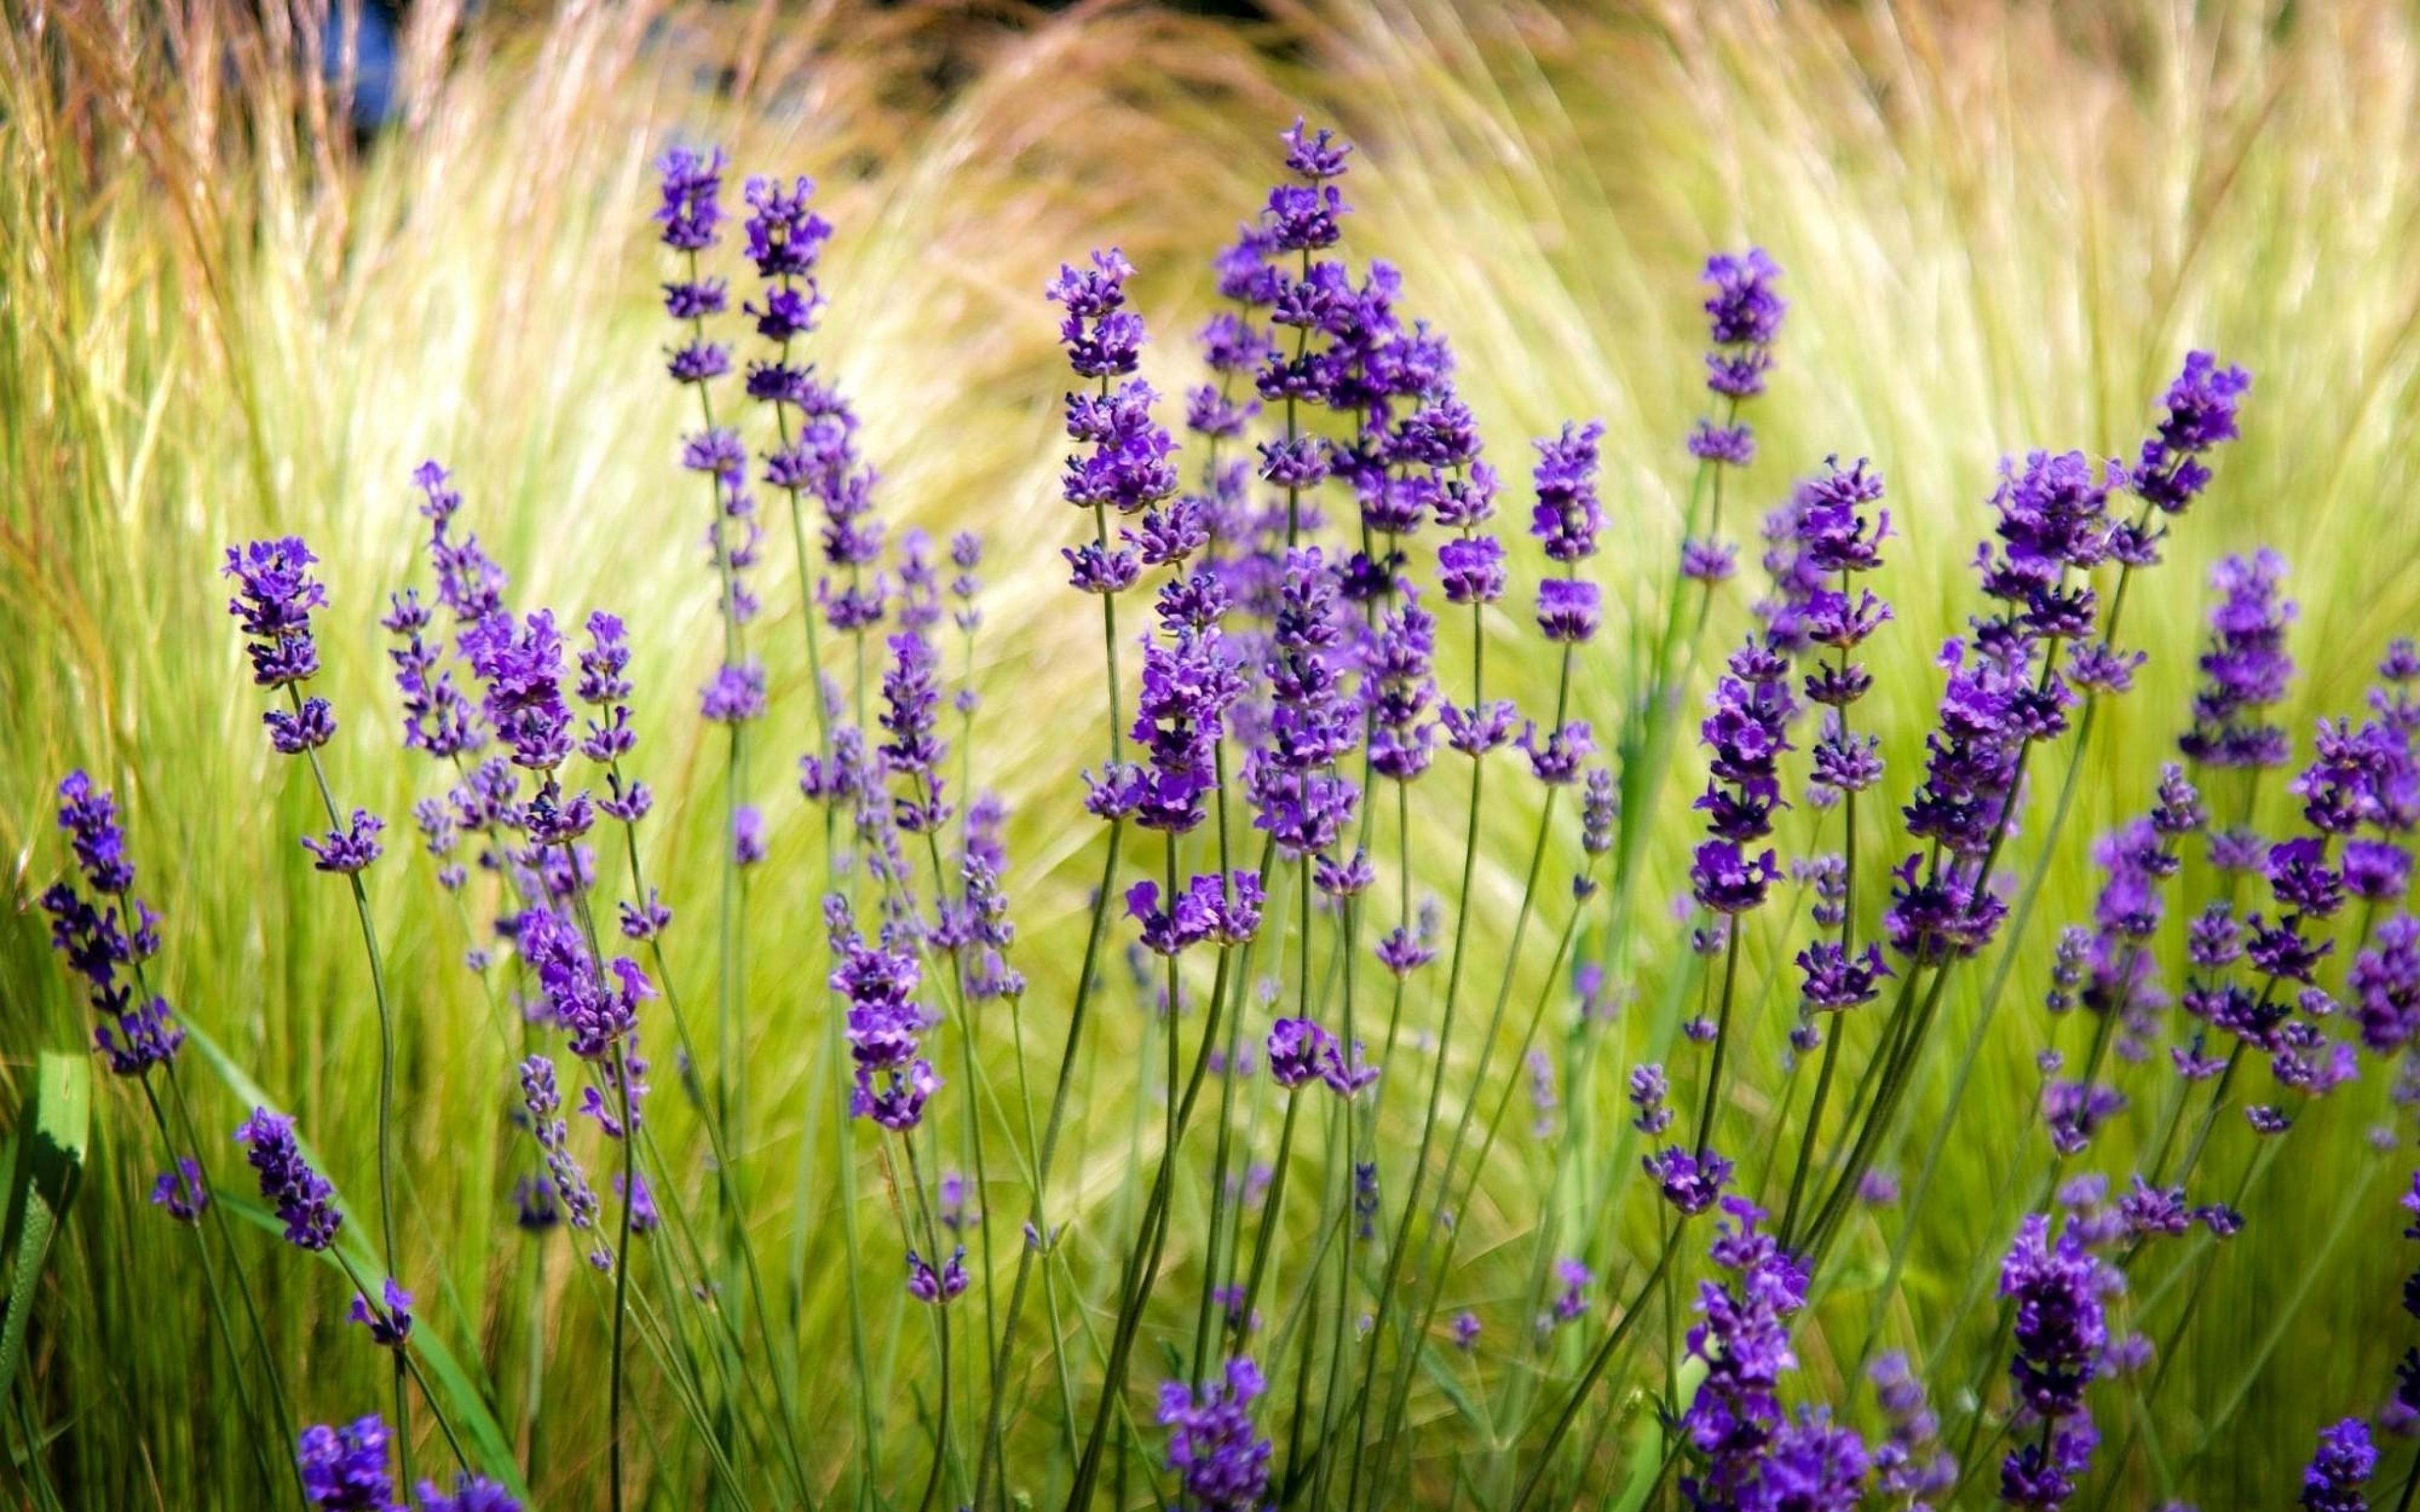 http://yesofcorsa.com/wp-content/uploads/2018/01/4K-Lavender-Desktop-Wallpaper-HD.jpg